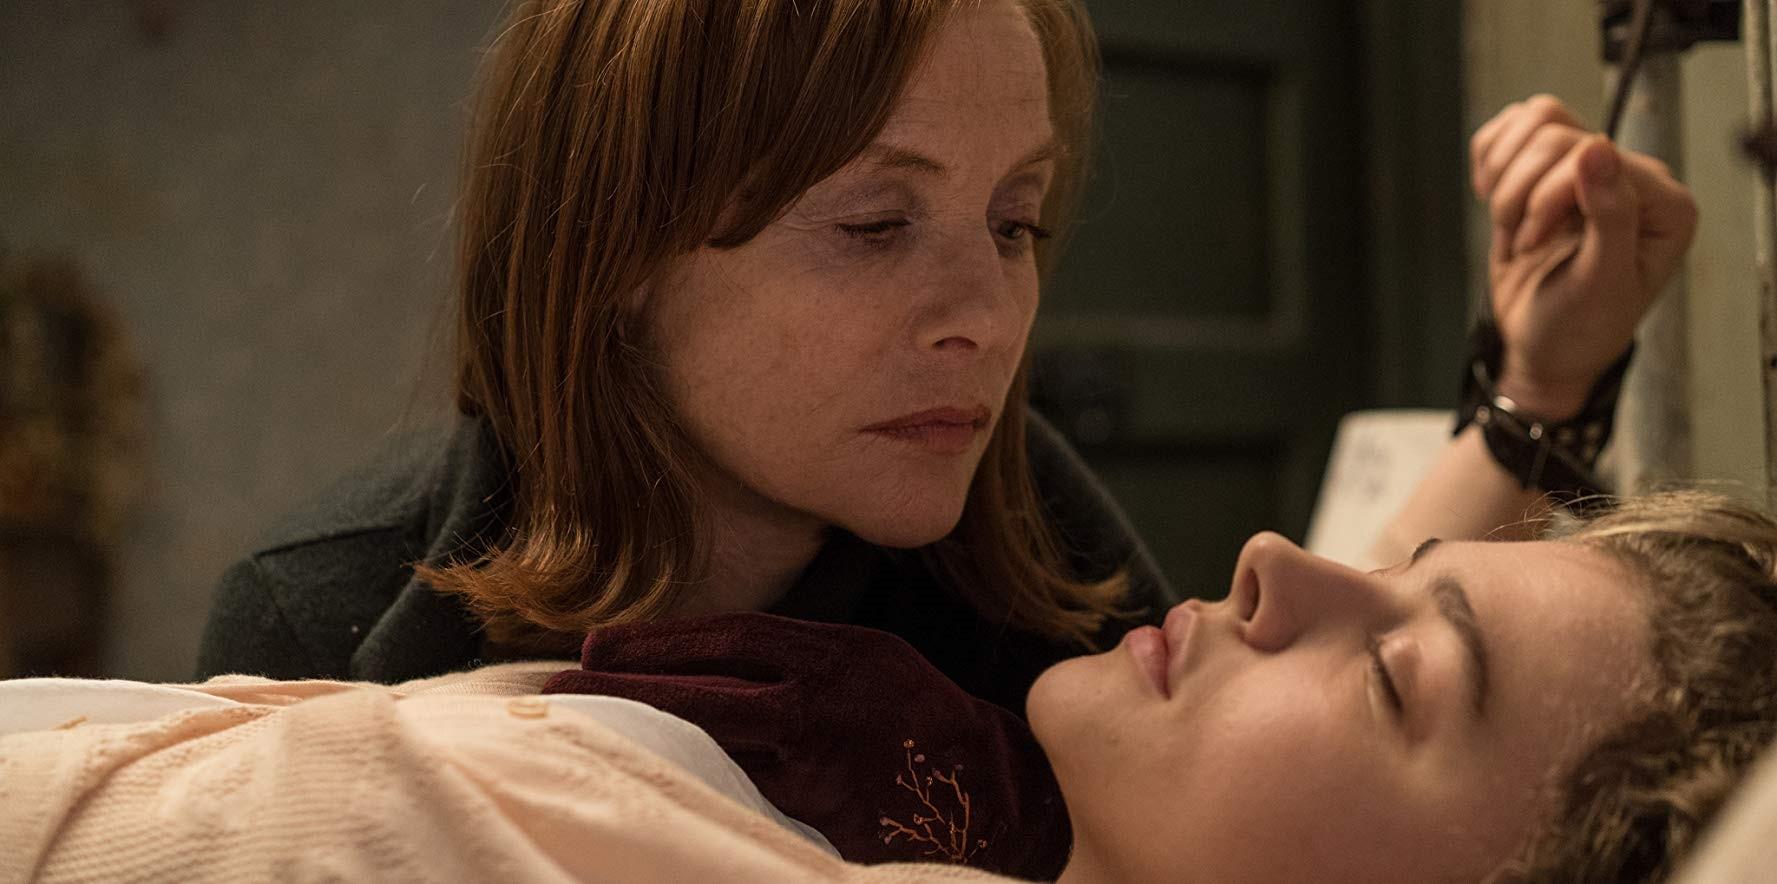 Isabelle Huppert och Cloë Grace Mortez i filmen Greta.